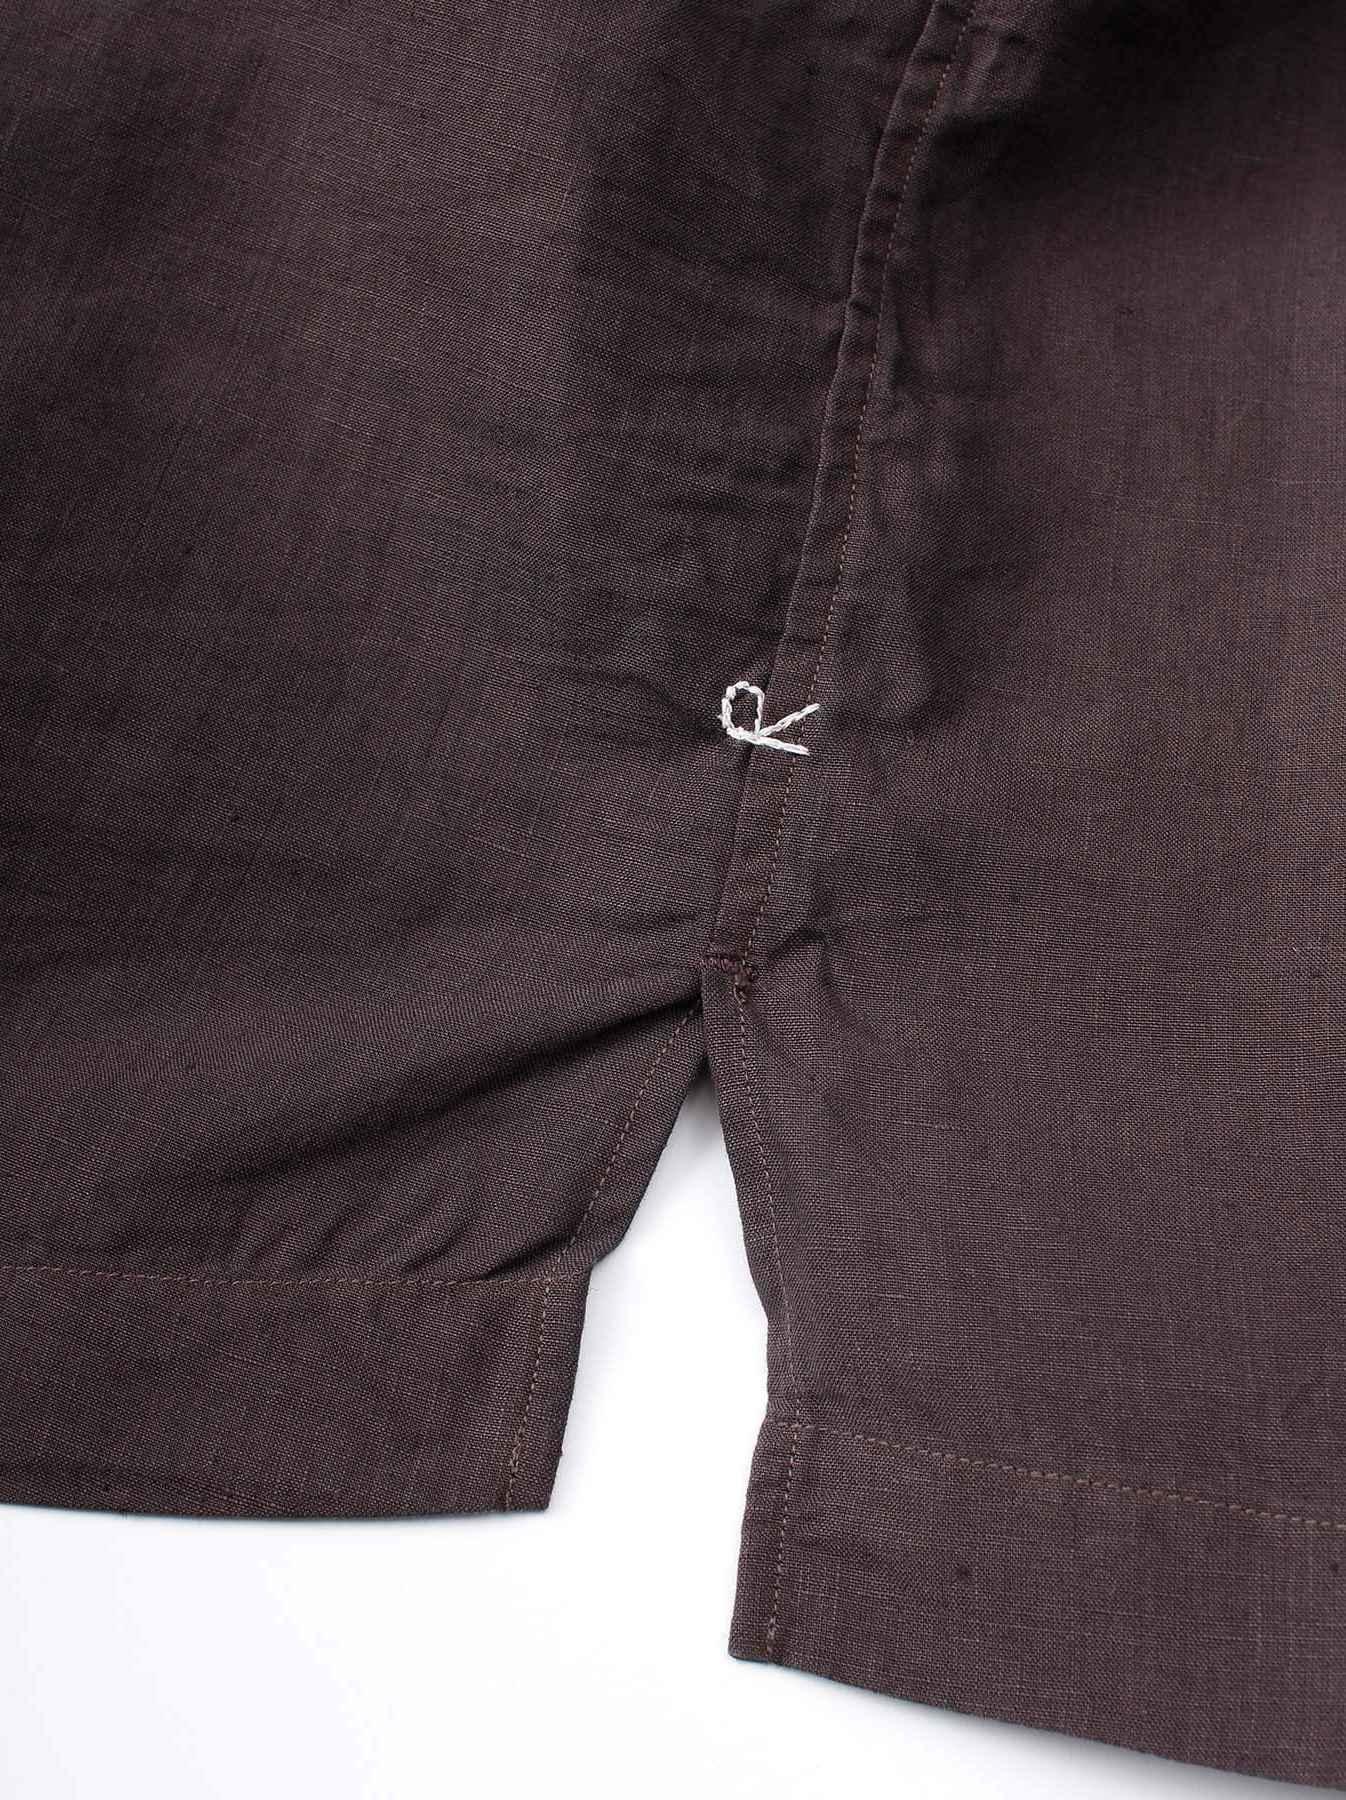 WH Piece-dyed Linen 908 Safari Shirt-8